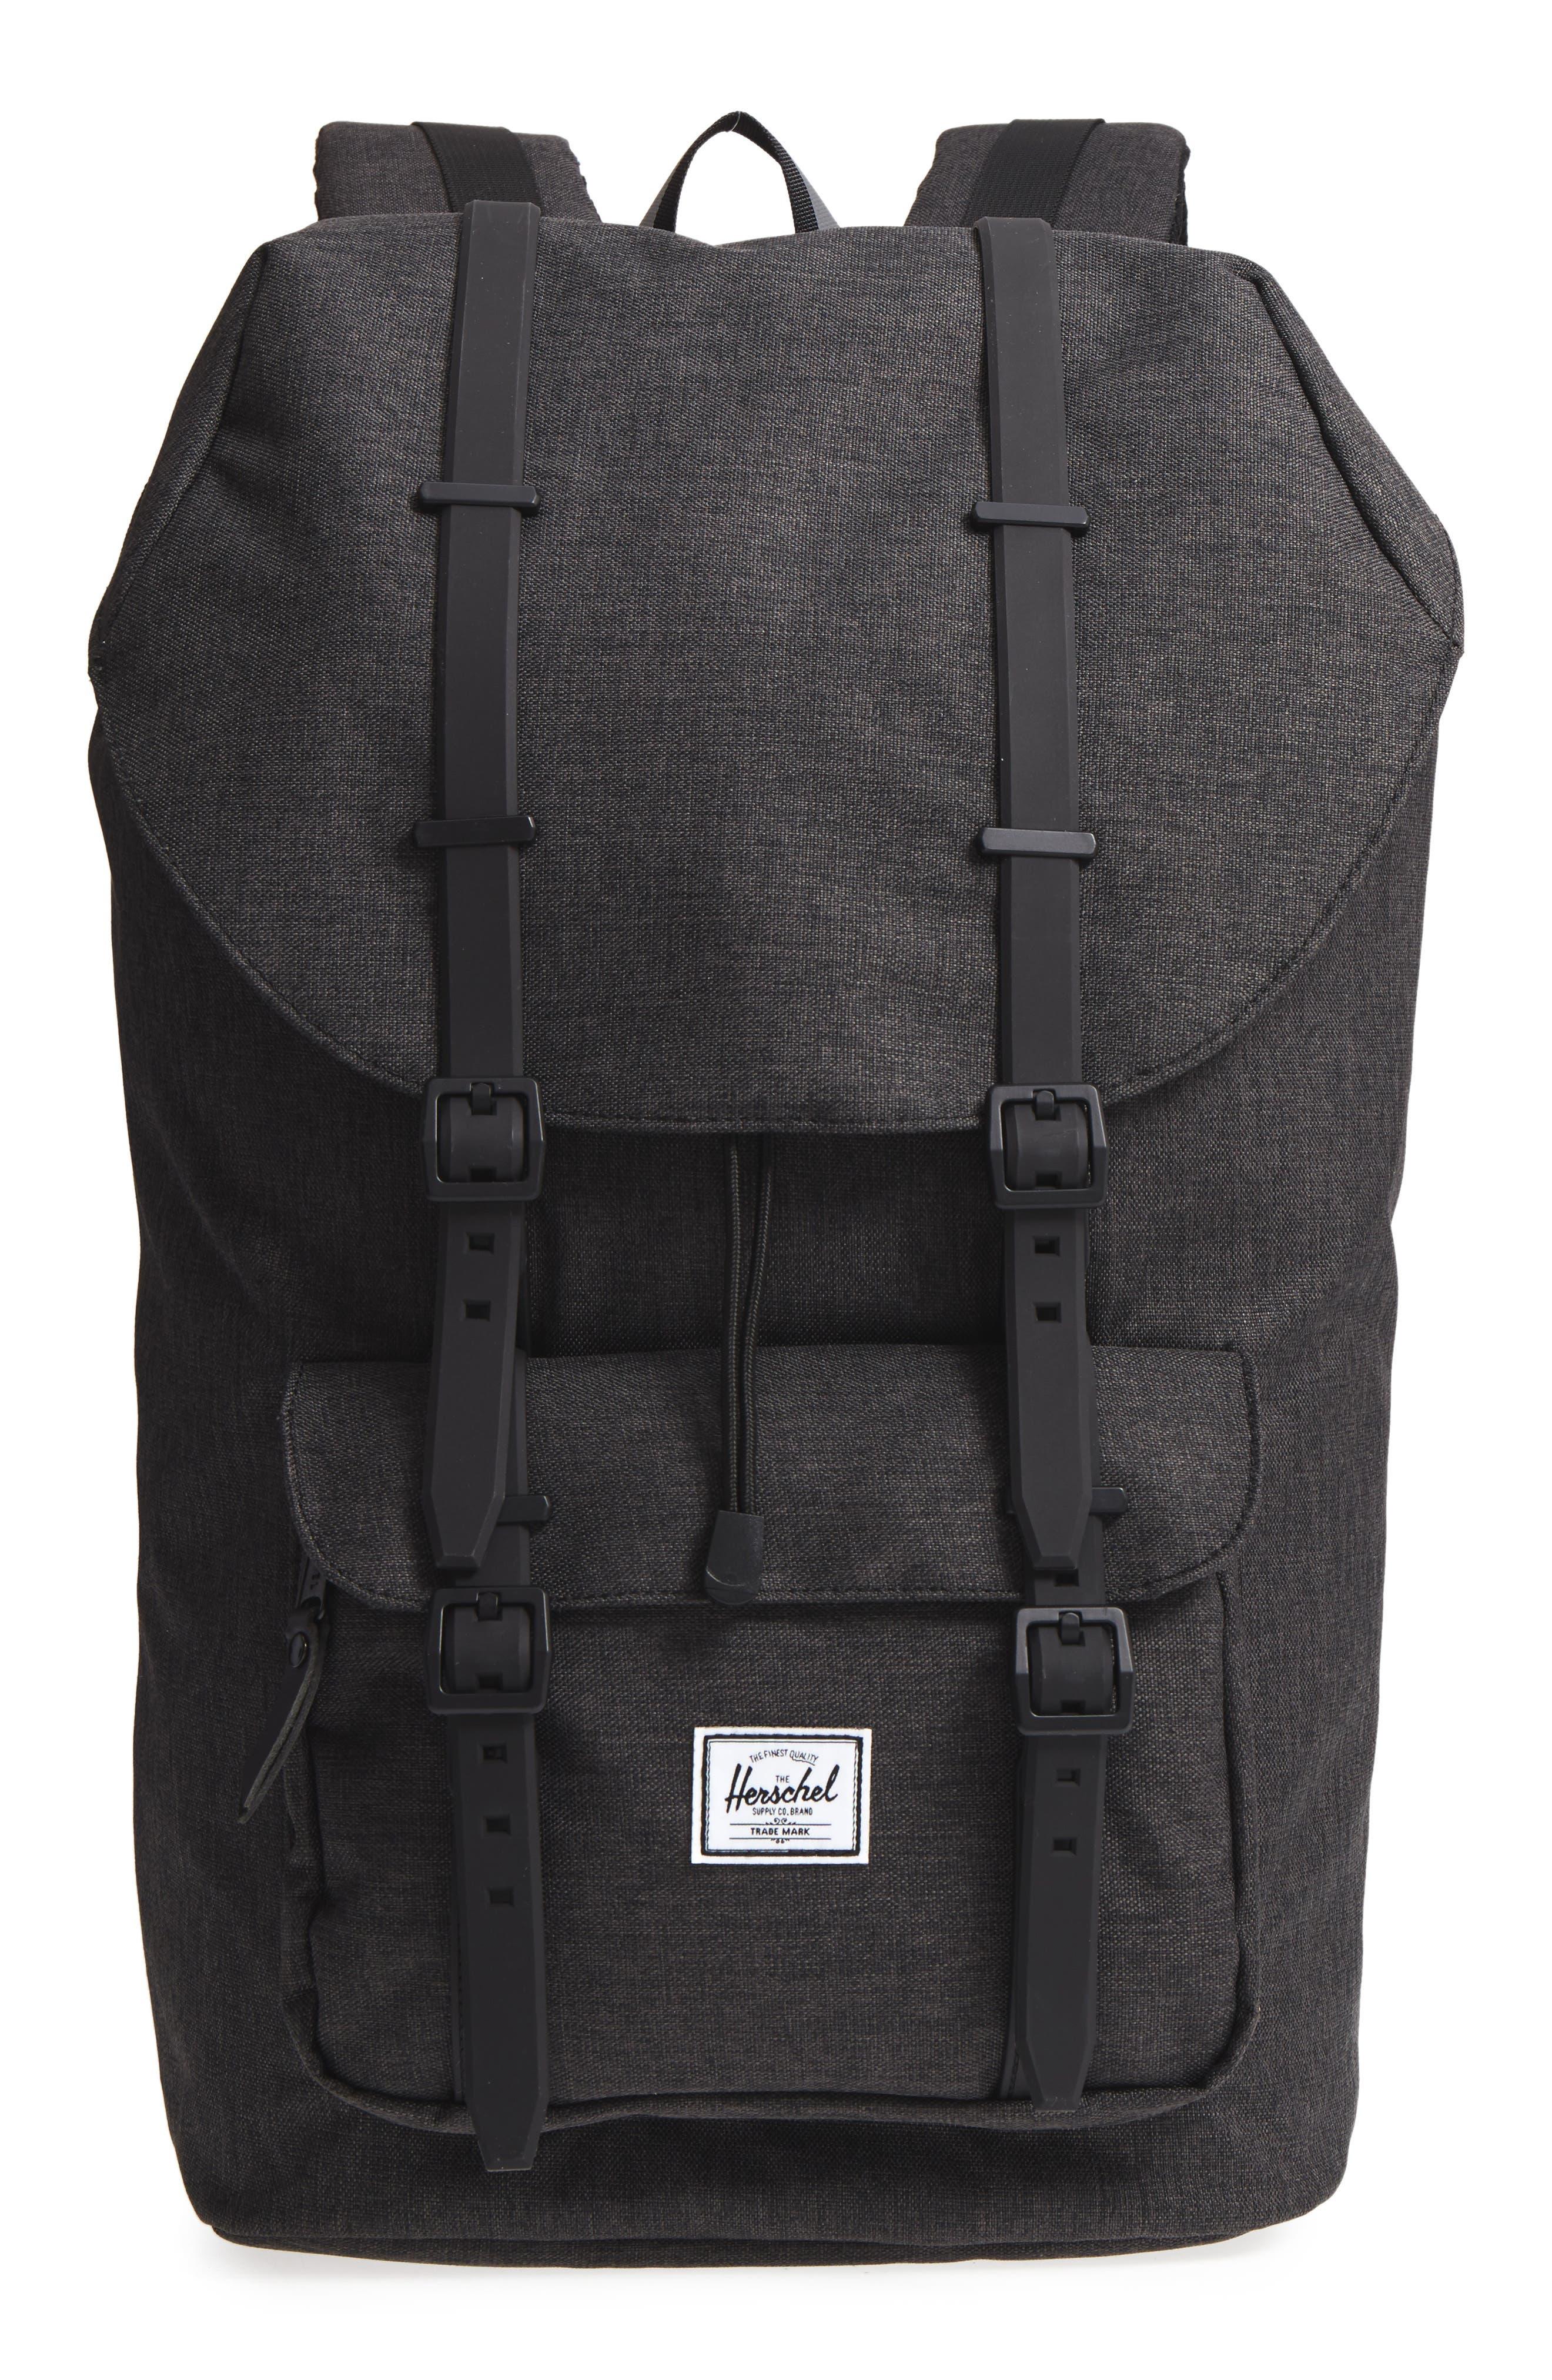 Little America - Reflective Backpack,                             Main thumbnail 1, color,                             Black Crosshatch/ Reflective